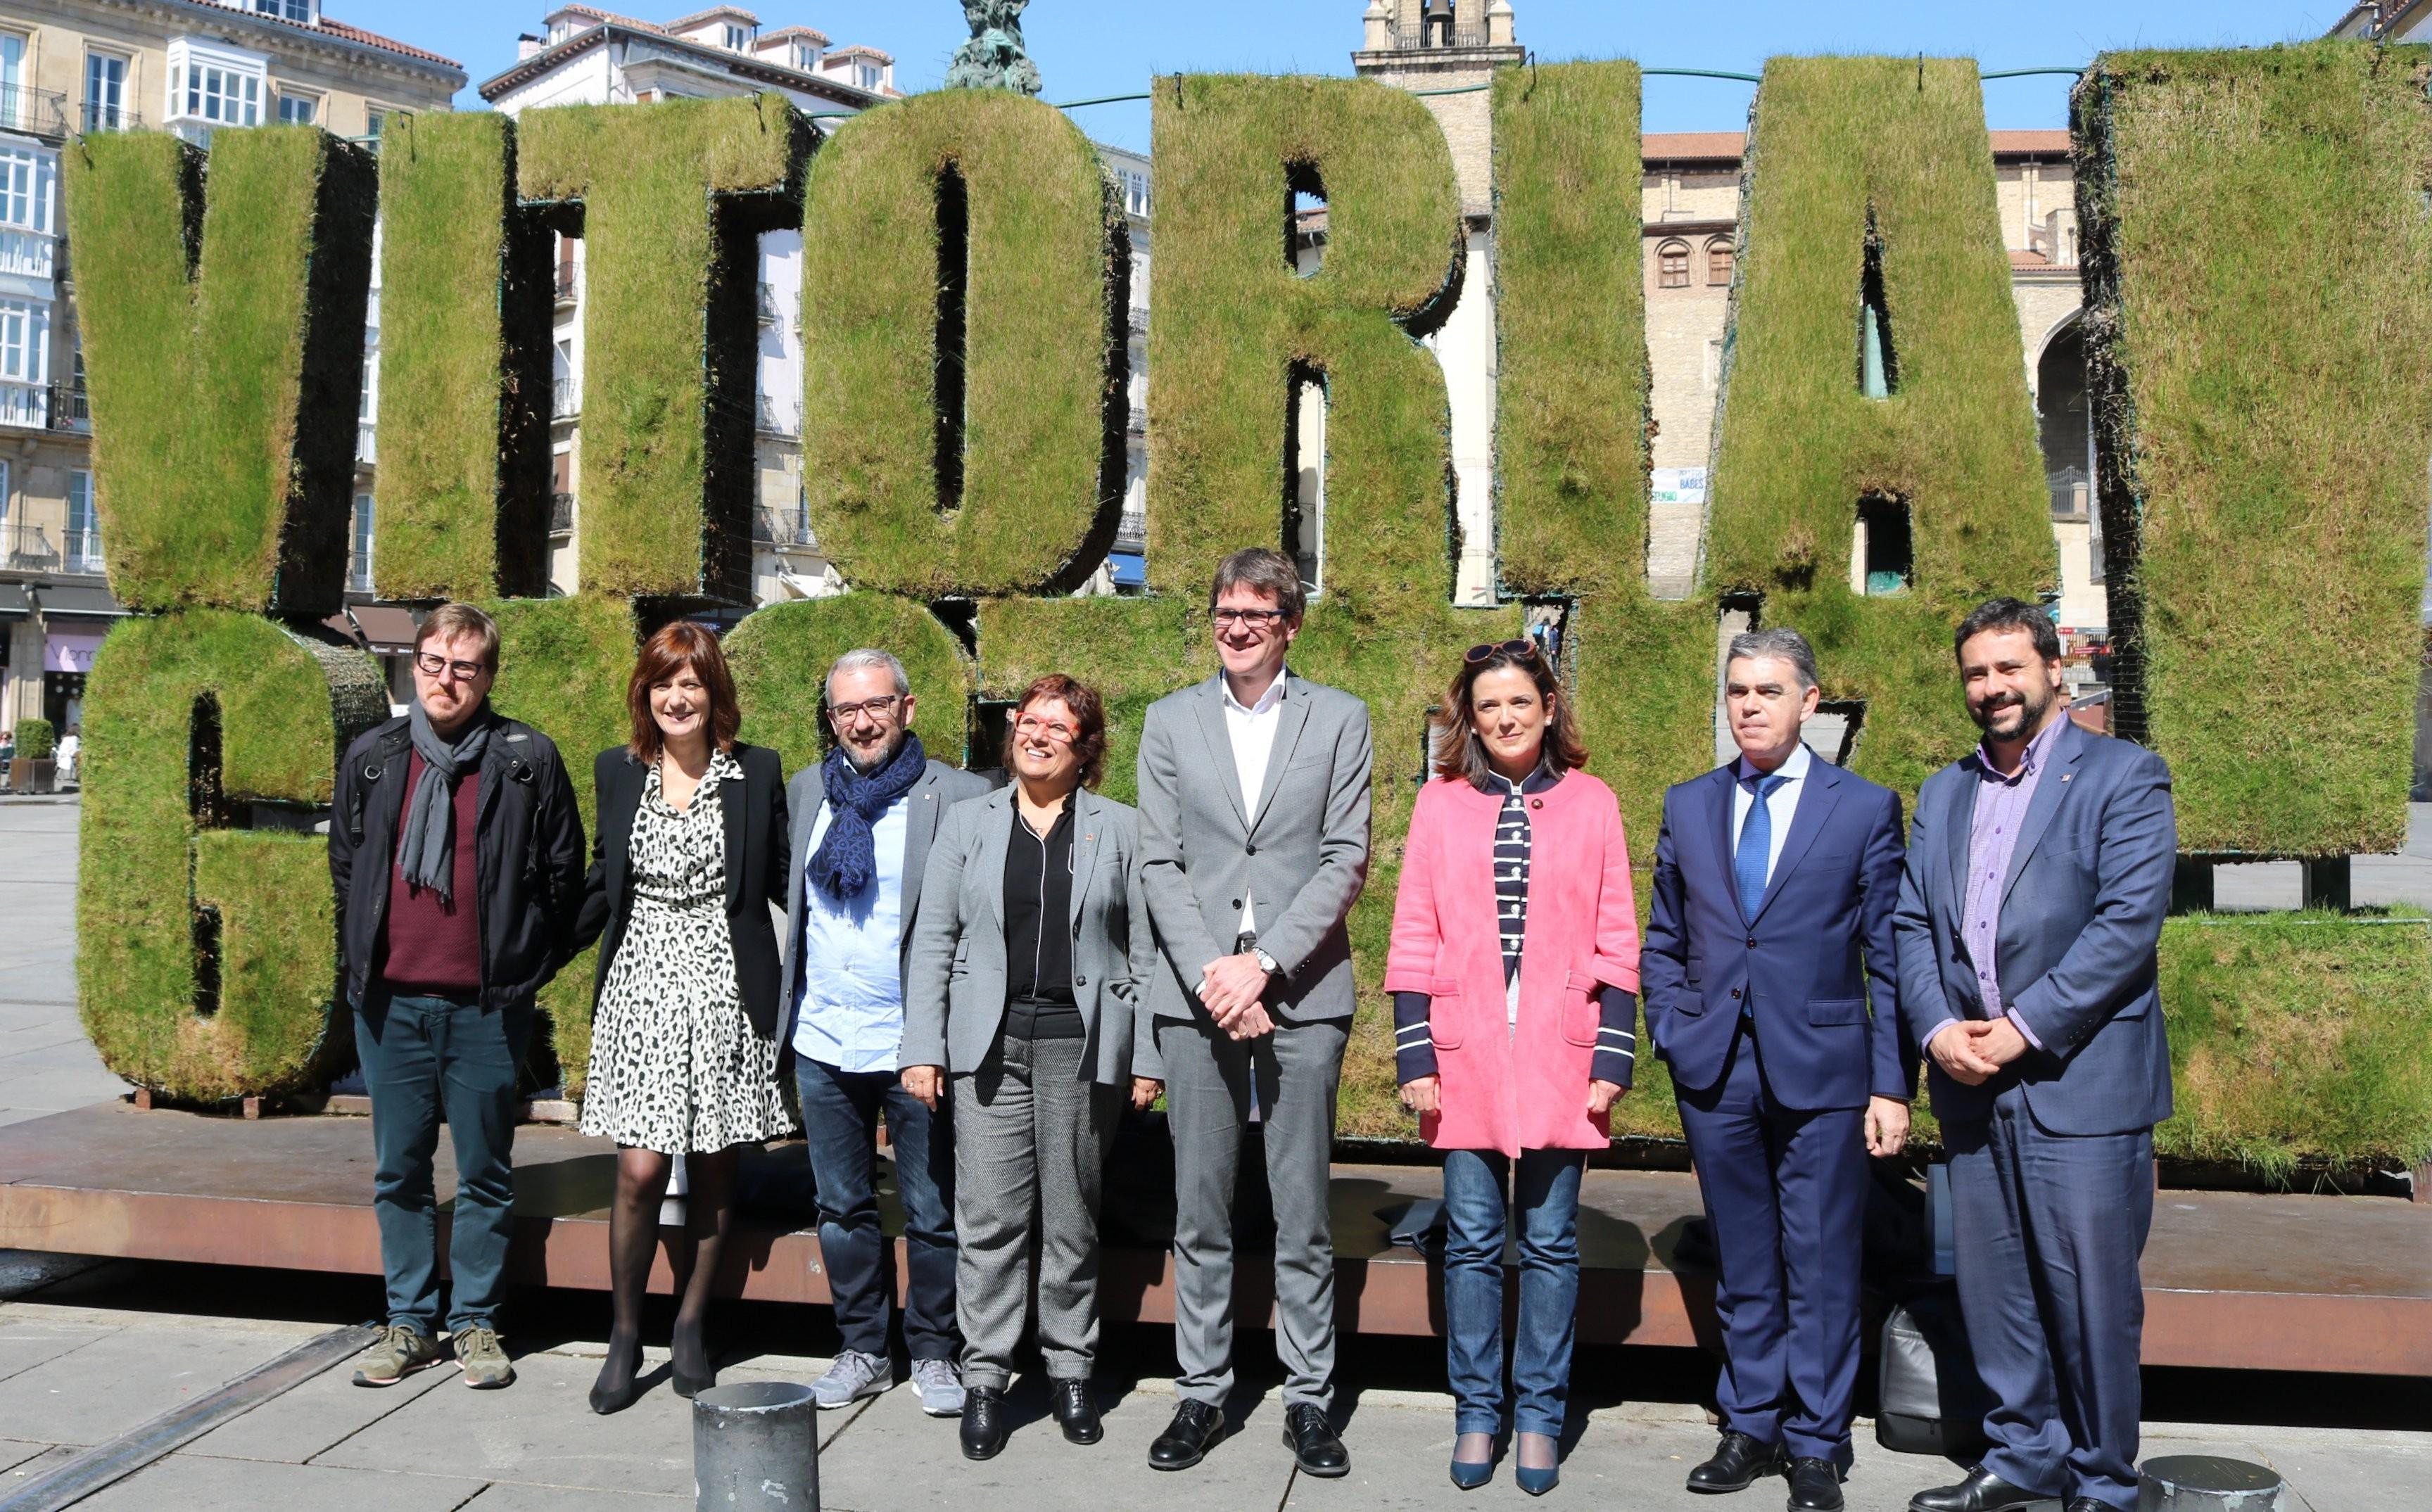 Generalitat de catalunya notas de prensa for Trabajo en vitoria gasteiz